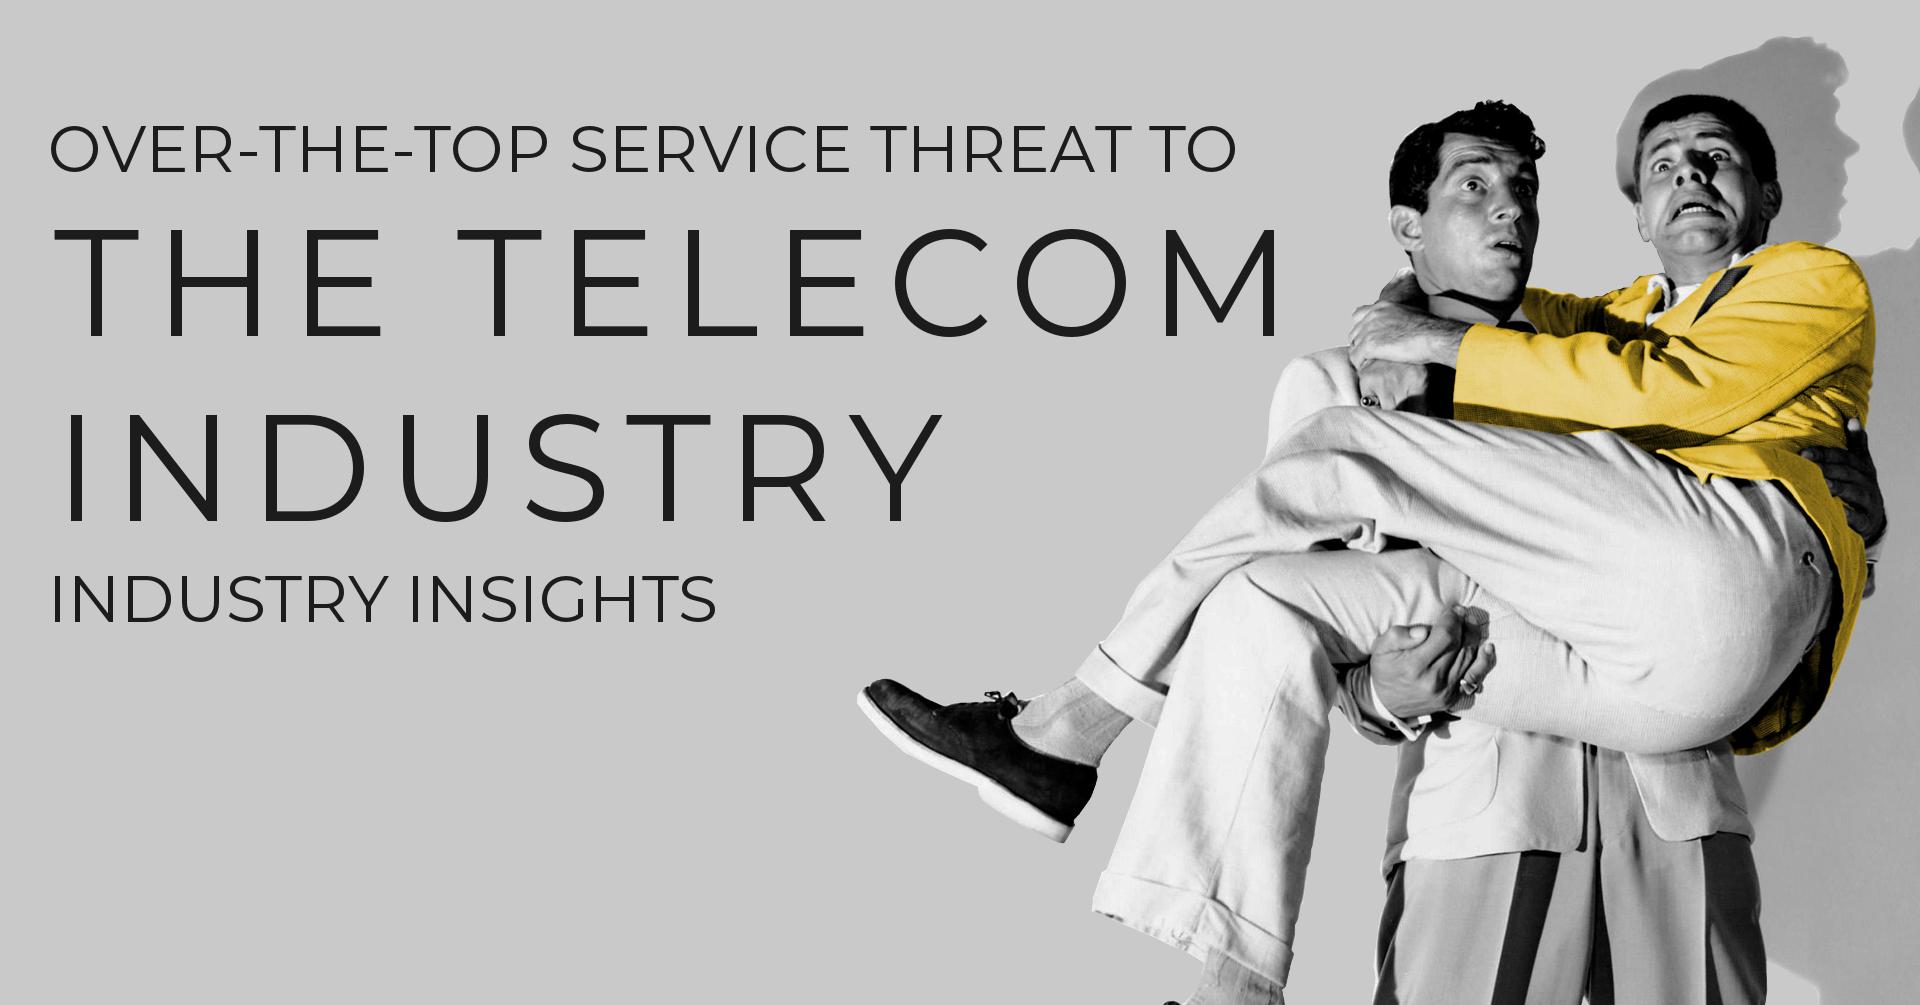 TelecomThreat